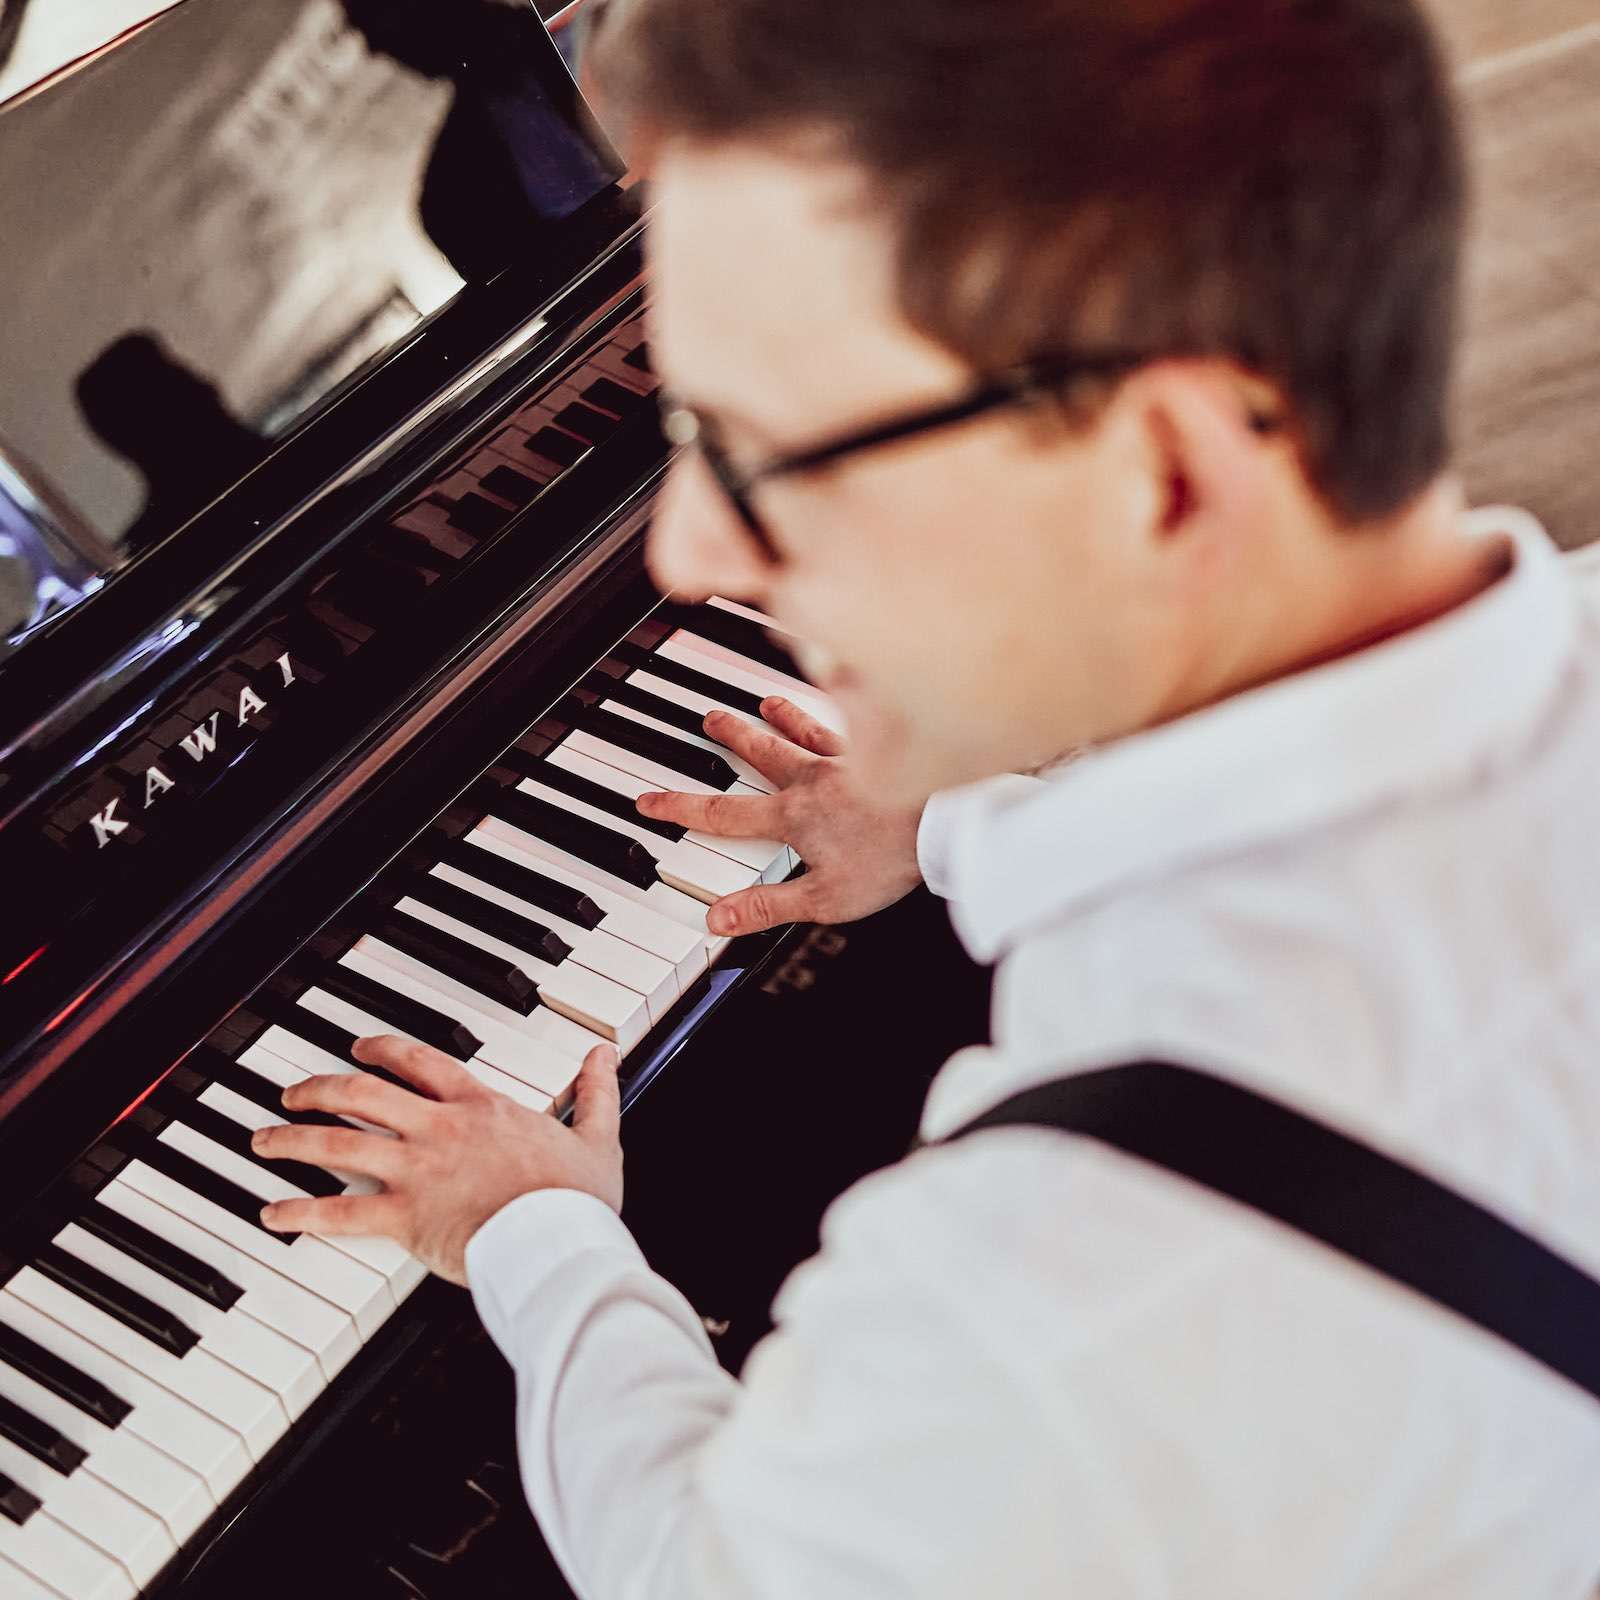 Pianist | Klavierspieler | Barpiano | Barpianist | Hannover | Hochzeit | Trauung | Empfang | Sektempfang | Dinner | Kirche | Buchen | Mieten | Anfragen | Alexander | Barsch | Lehmann | Eventservice